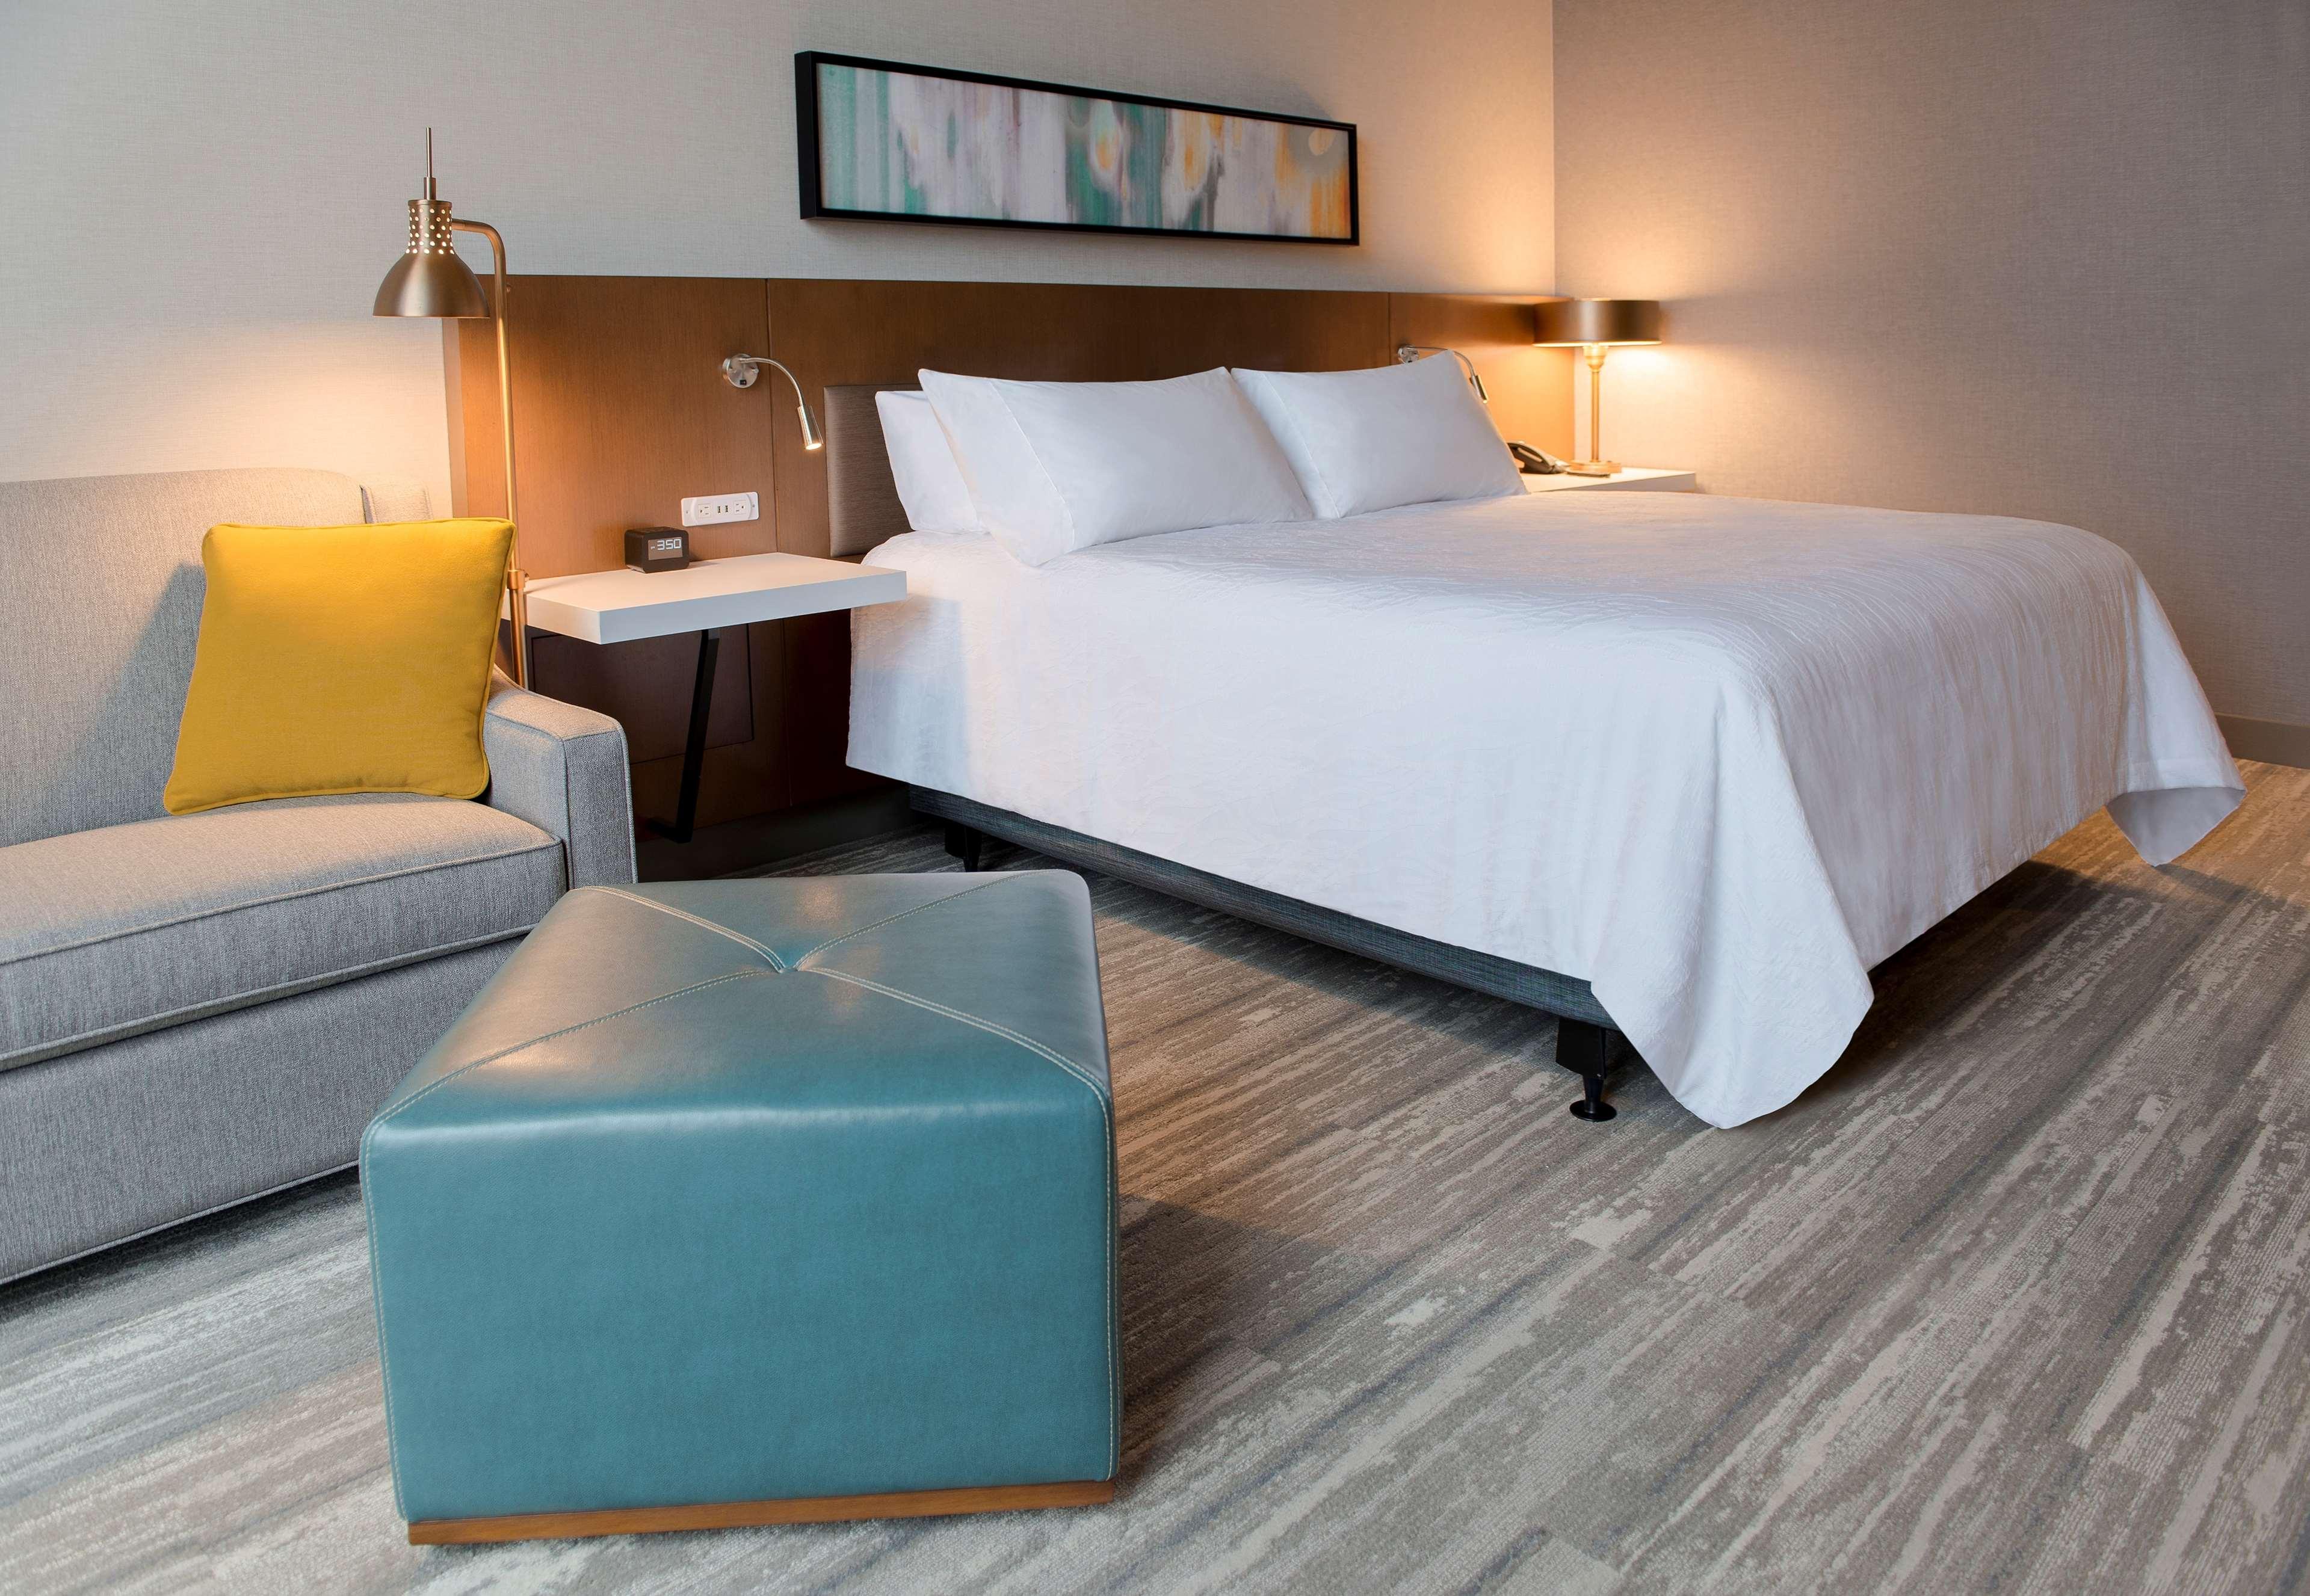 Hilton Garden Inn Wausau image 28